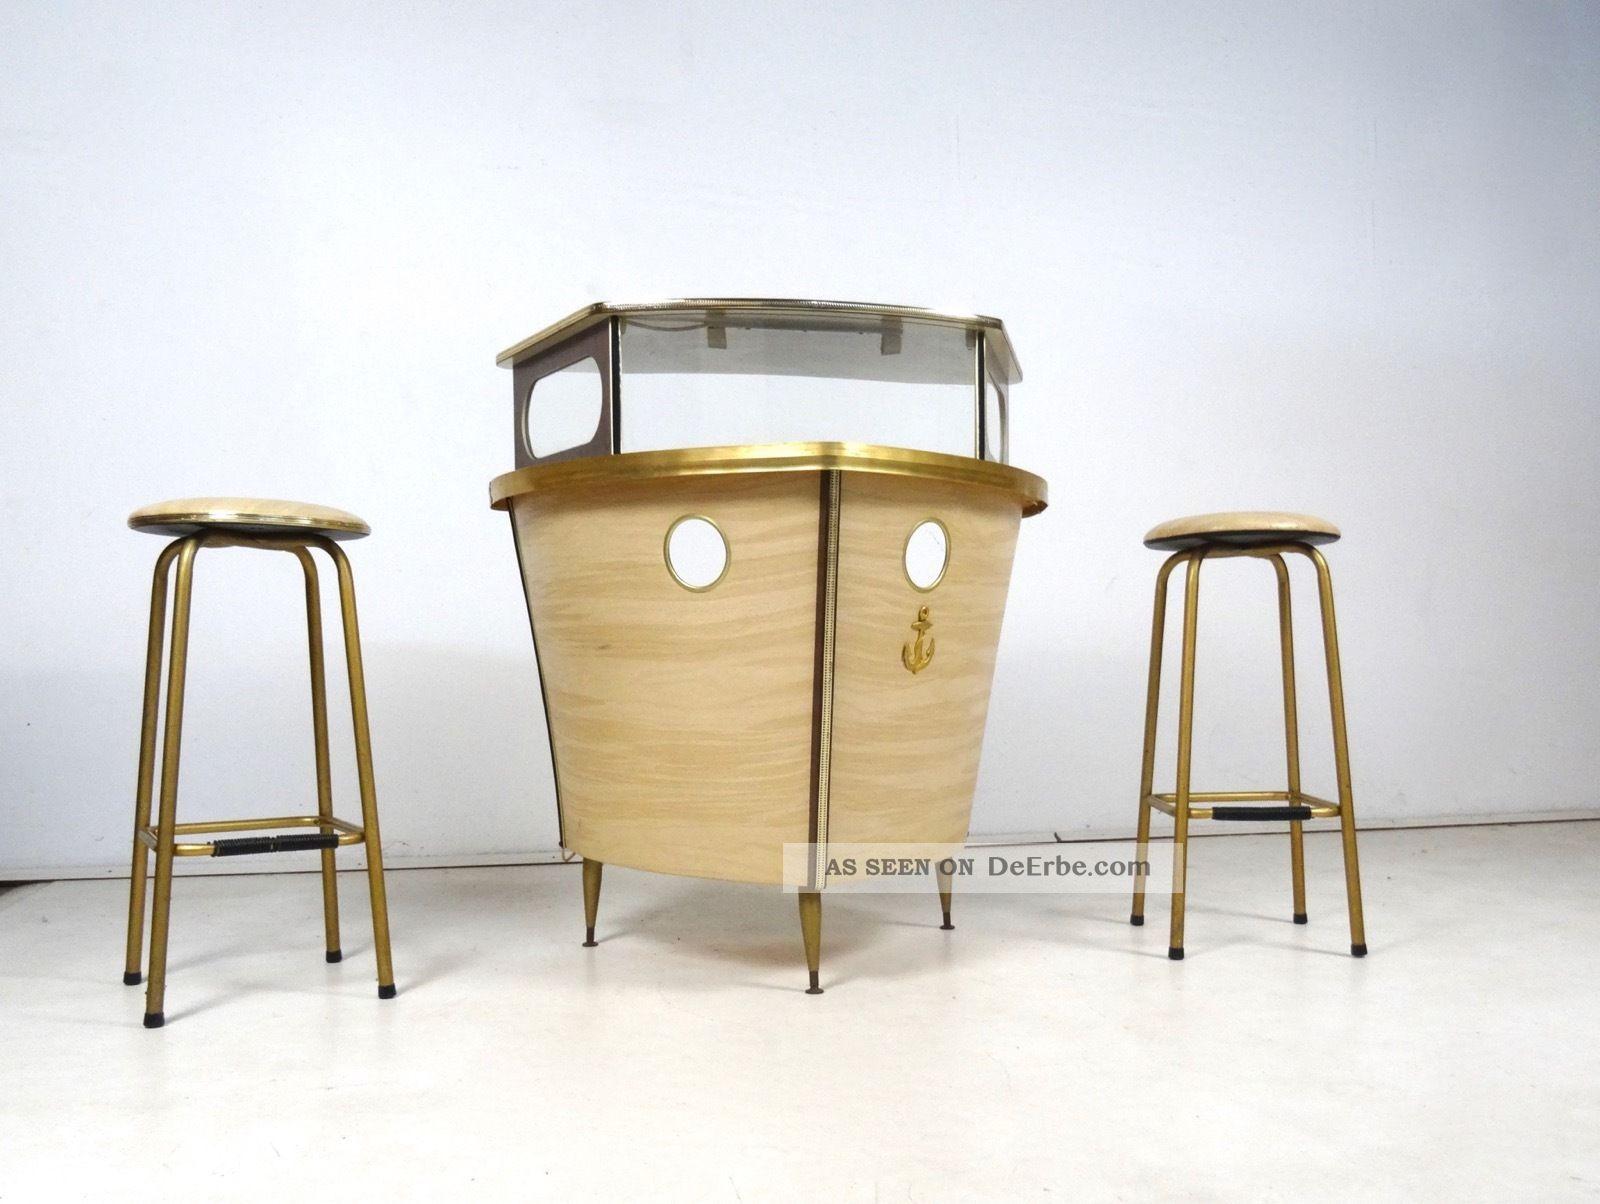 Seltene 60er Schiff Bar BarmÖbel Schif Form Vintage Formica Glas 1960-1969 Bild